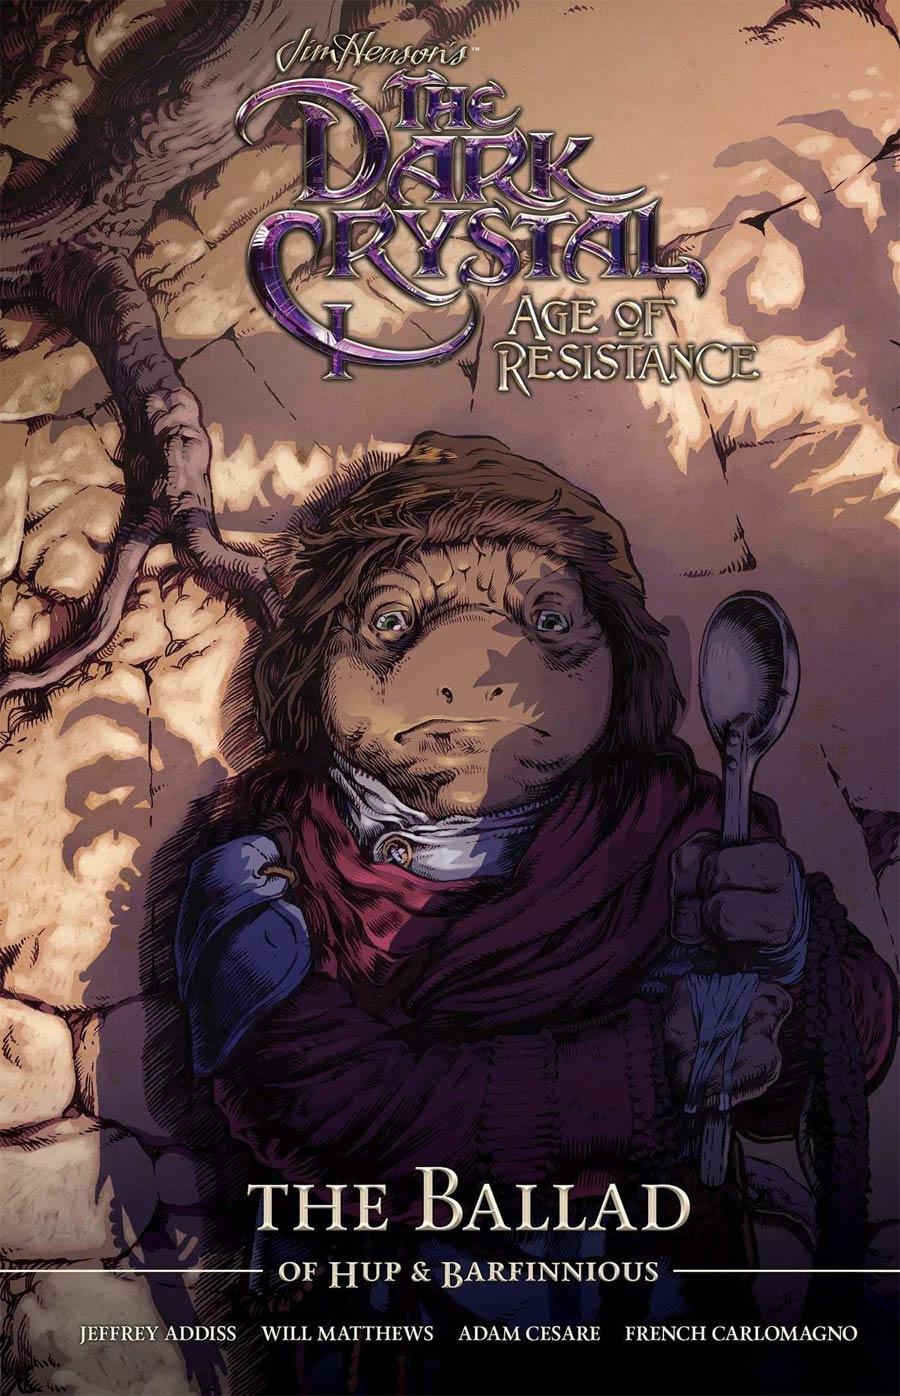 Jim Hensons Dark Crystal Age Of Resistance Ballad Of Hupp & Barfinnious HC